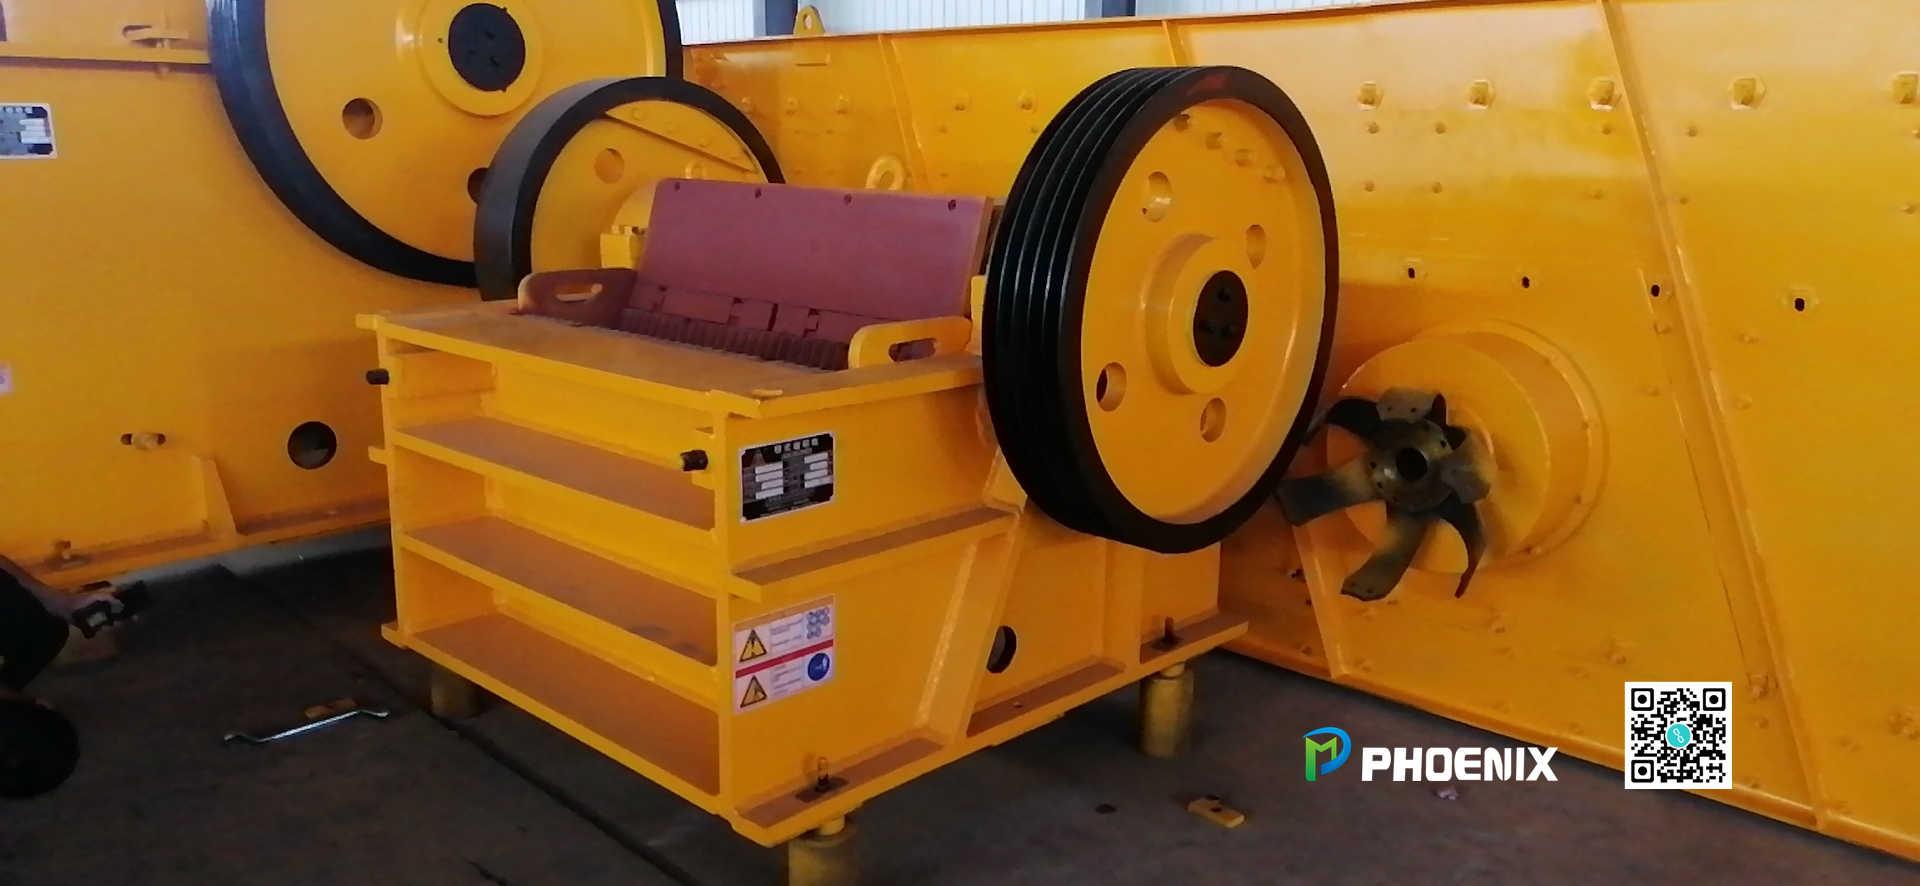 <b>吉林时产500吨砂石生产线暨破碎机设备发货回顾</b>